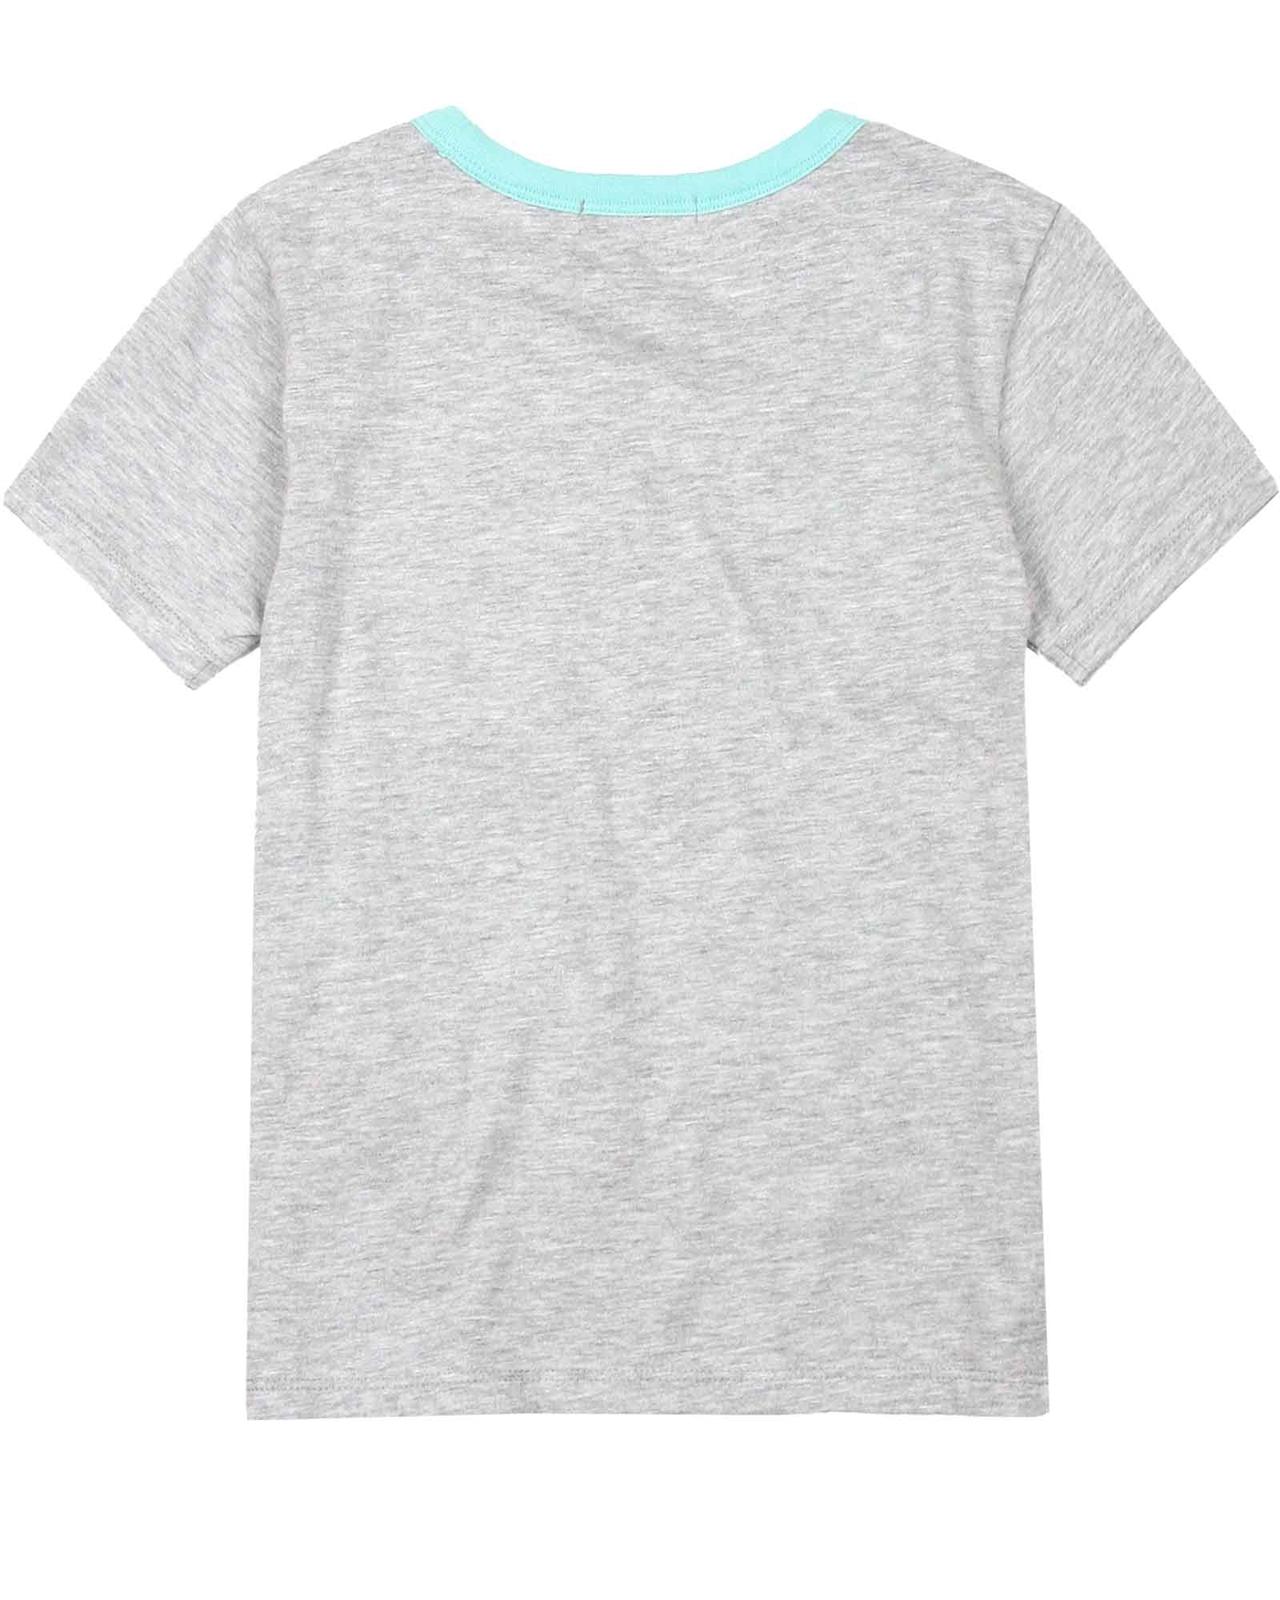 Billybandit Boys T-Shirt with Chest Pocket Sizes 3-10